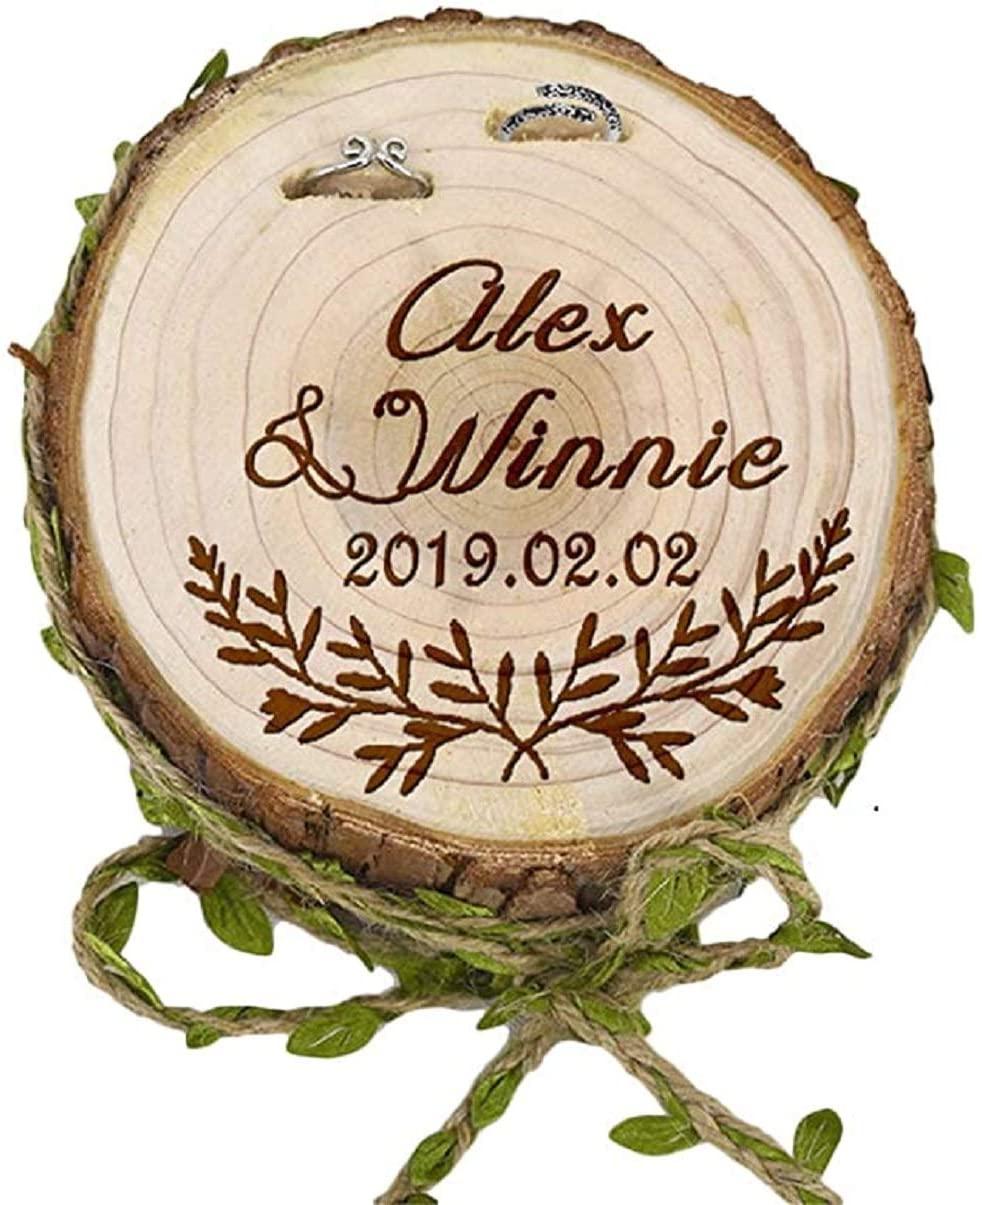 epinglu Personalised Wooden Wedding Ring Box - Custom Engraved Rustic Ring Box Marry Proposal Engagement Ring Bearer Box Holder